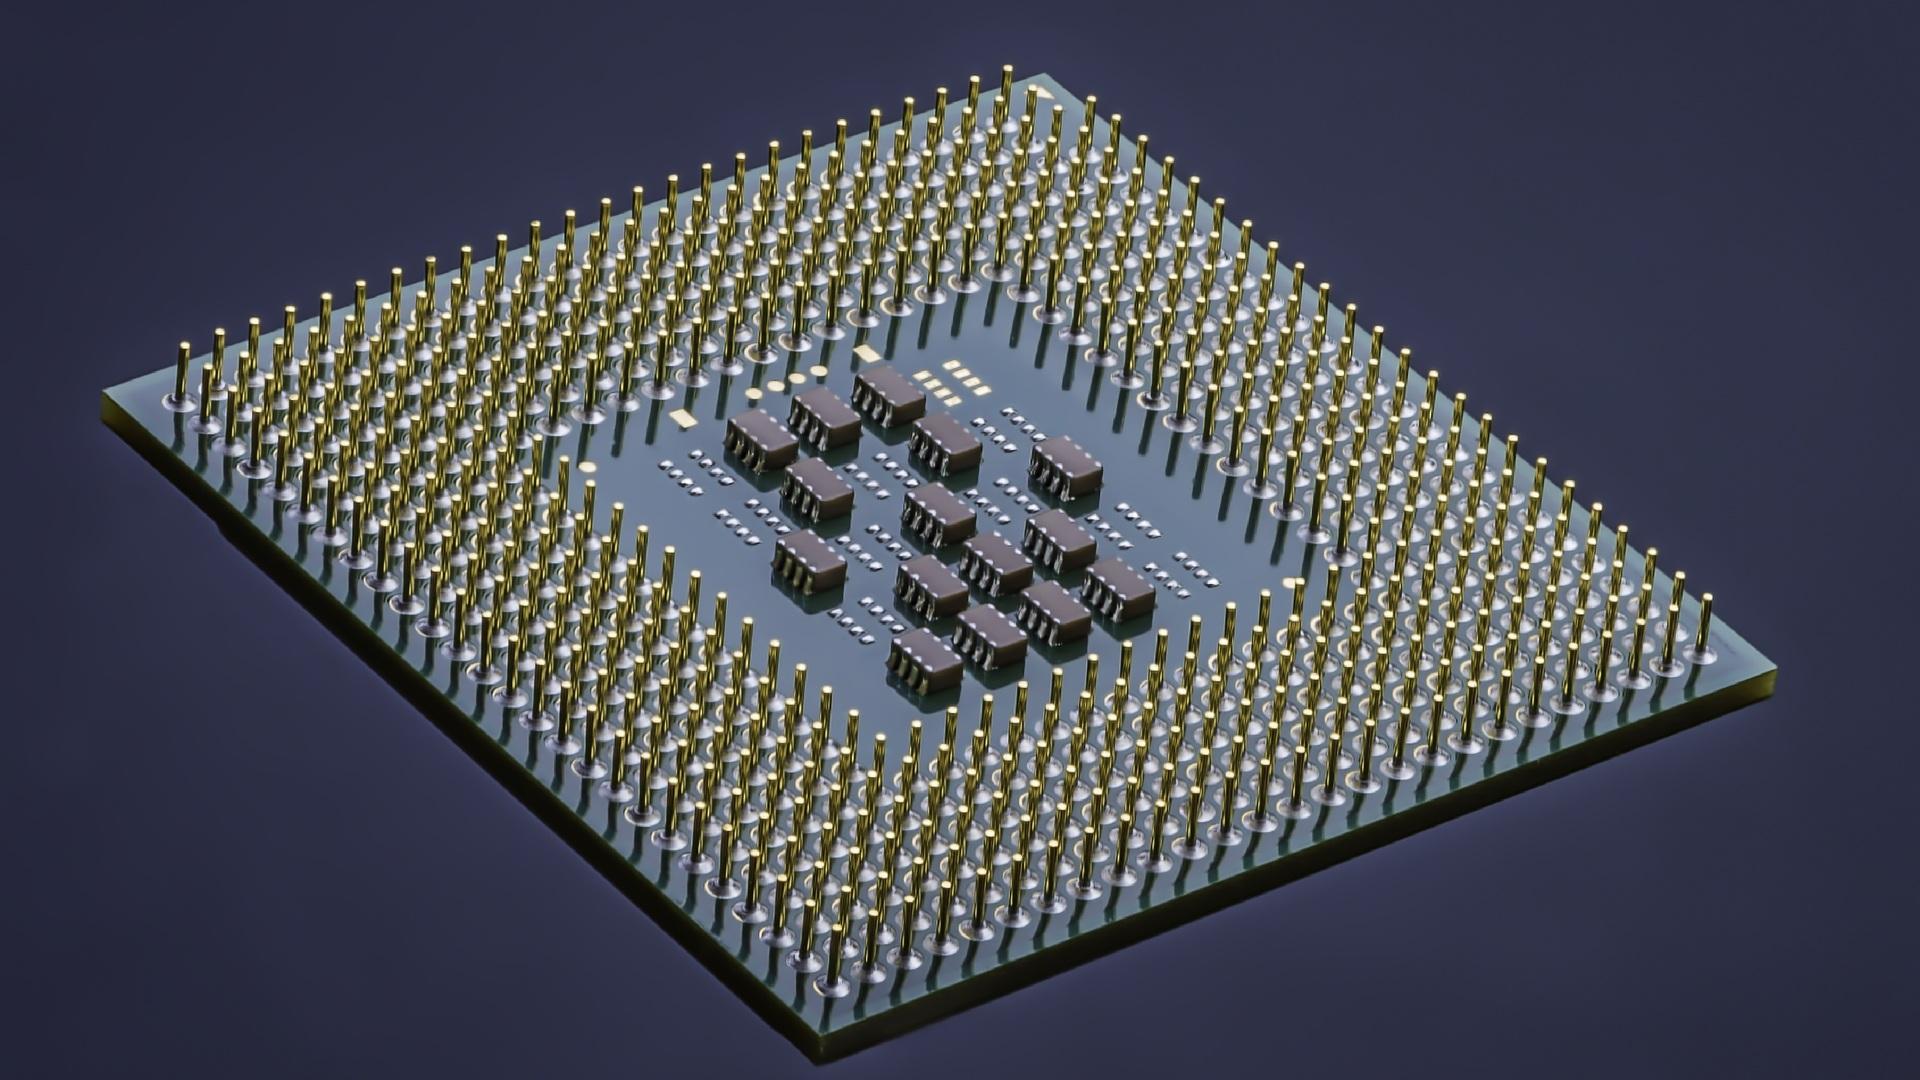 integrated-circuit-computer-processor-microchip-technology-yd.jpg